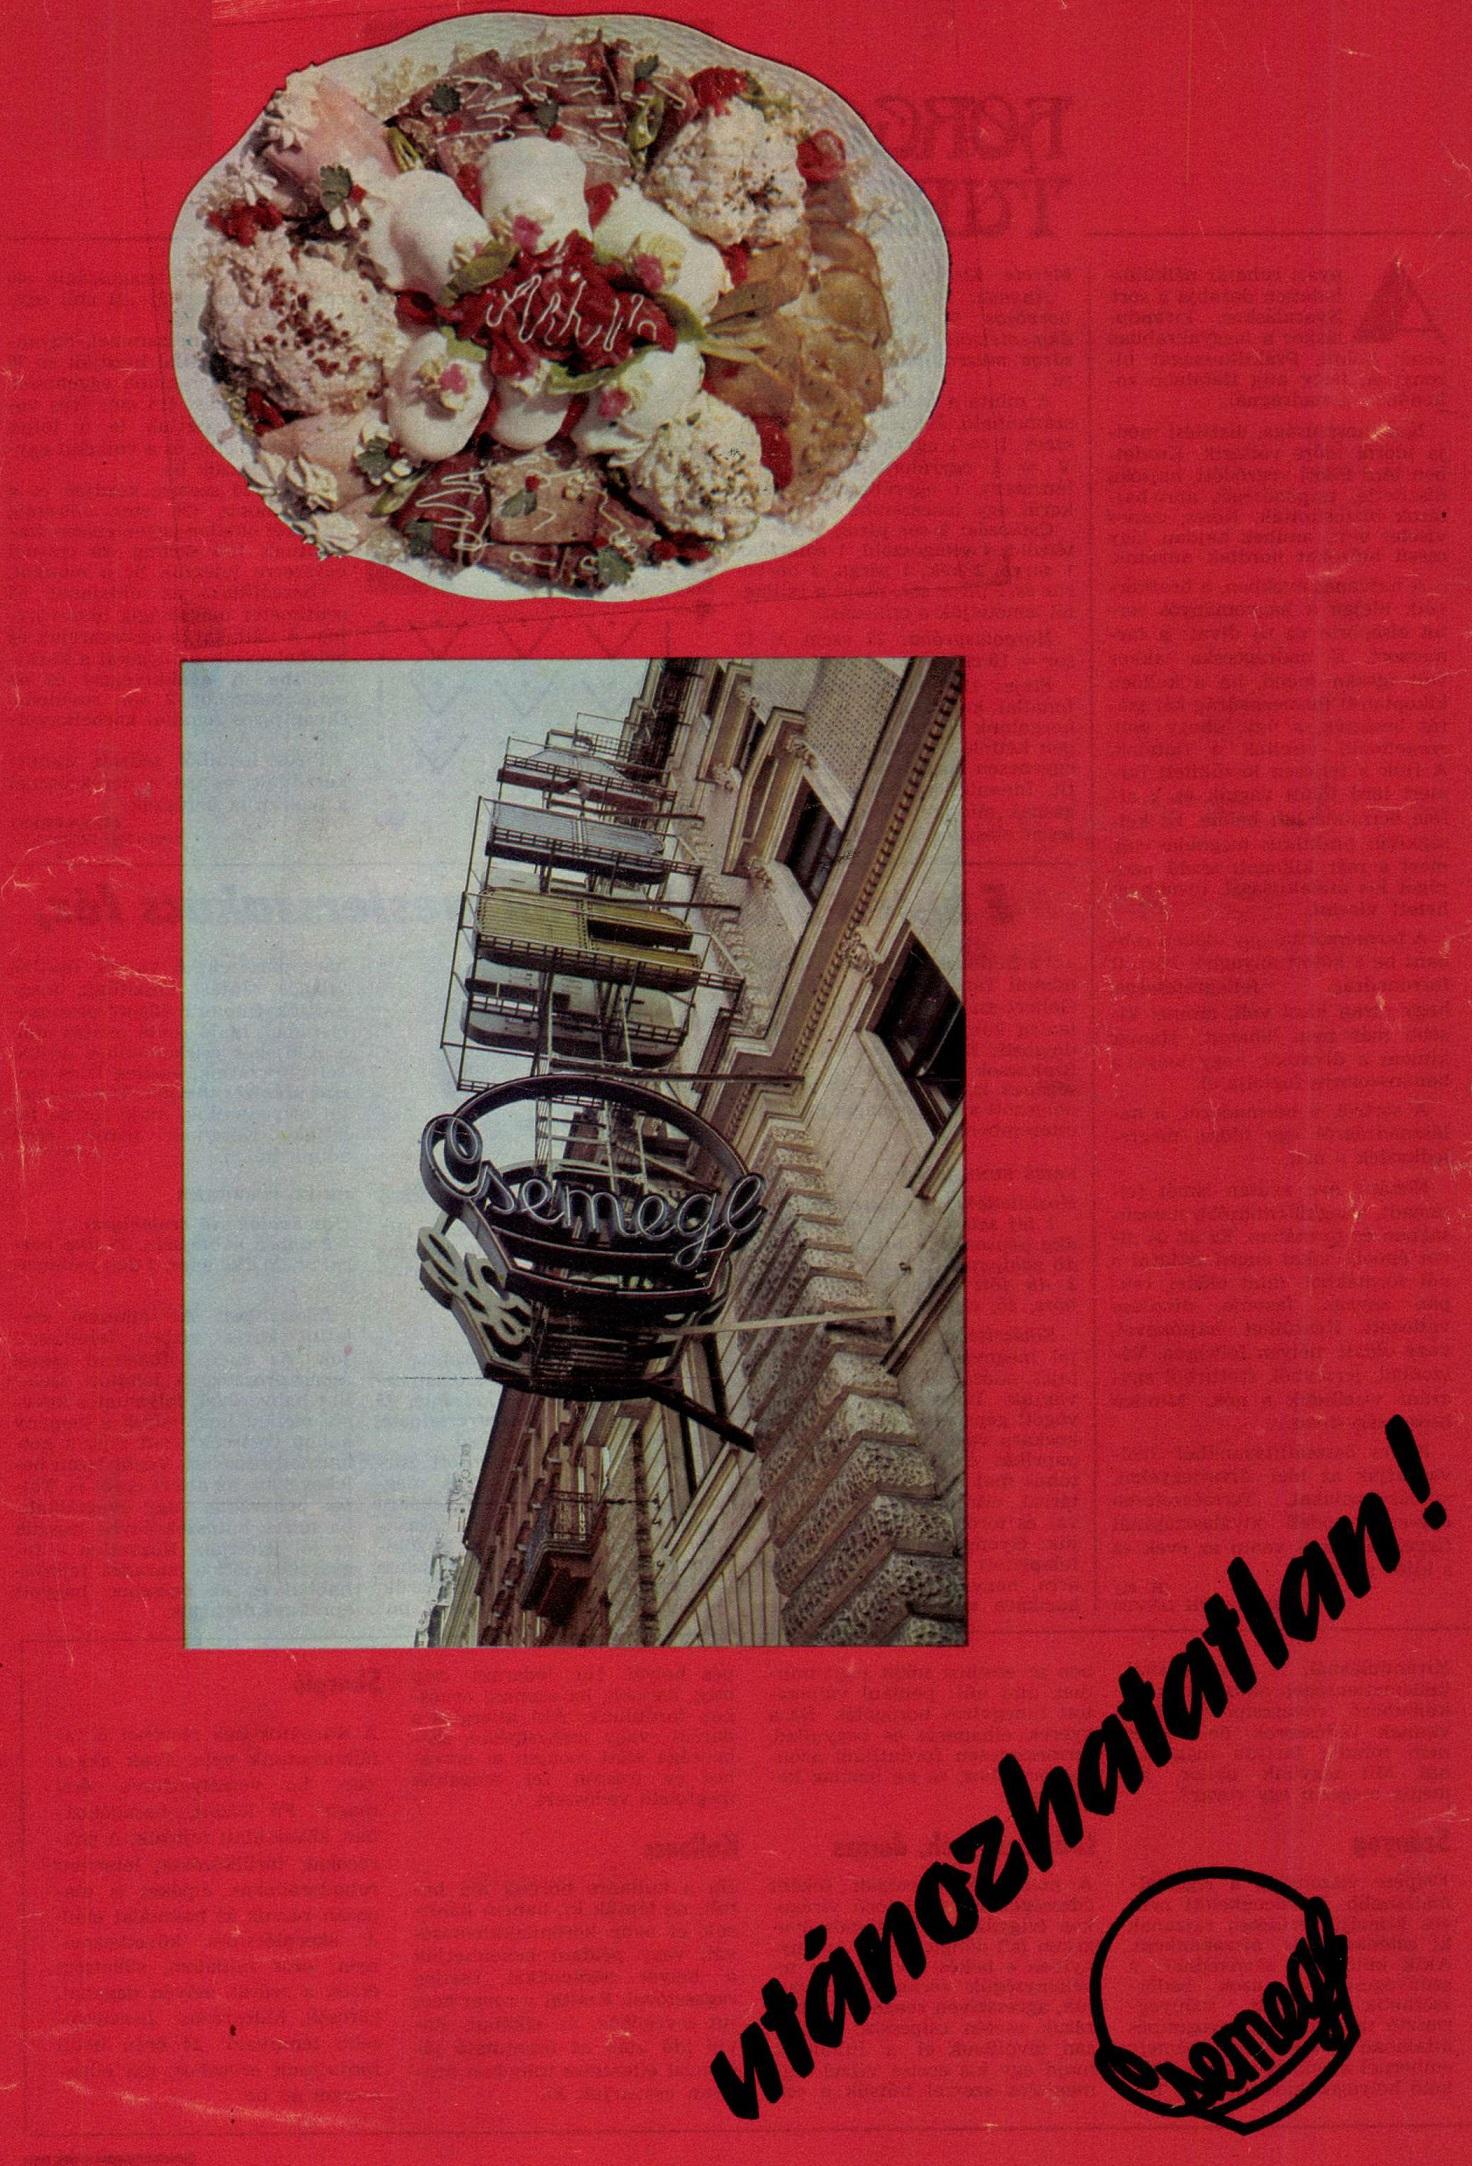 idokapszula_nb_i_1983_84_tavaszi_zaras_tabellaparade_reklam_2.jpg